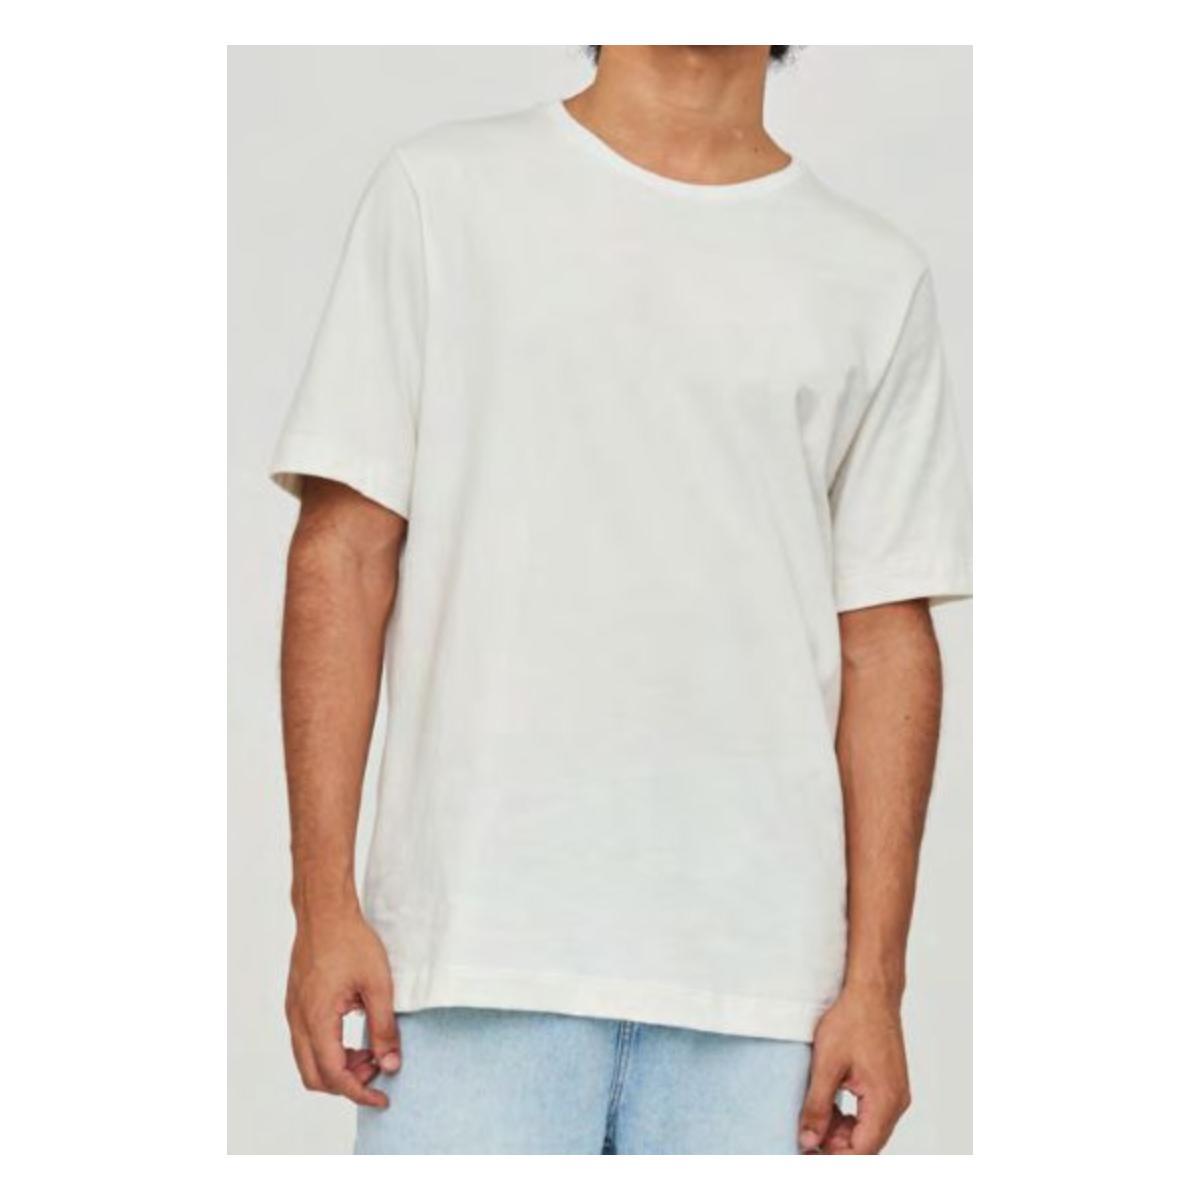 Camiseta Masculina Coca-cola Clothing 353207438 58529 Off White